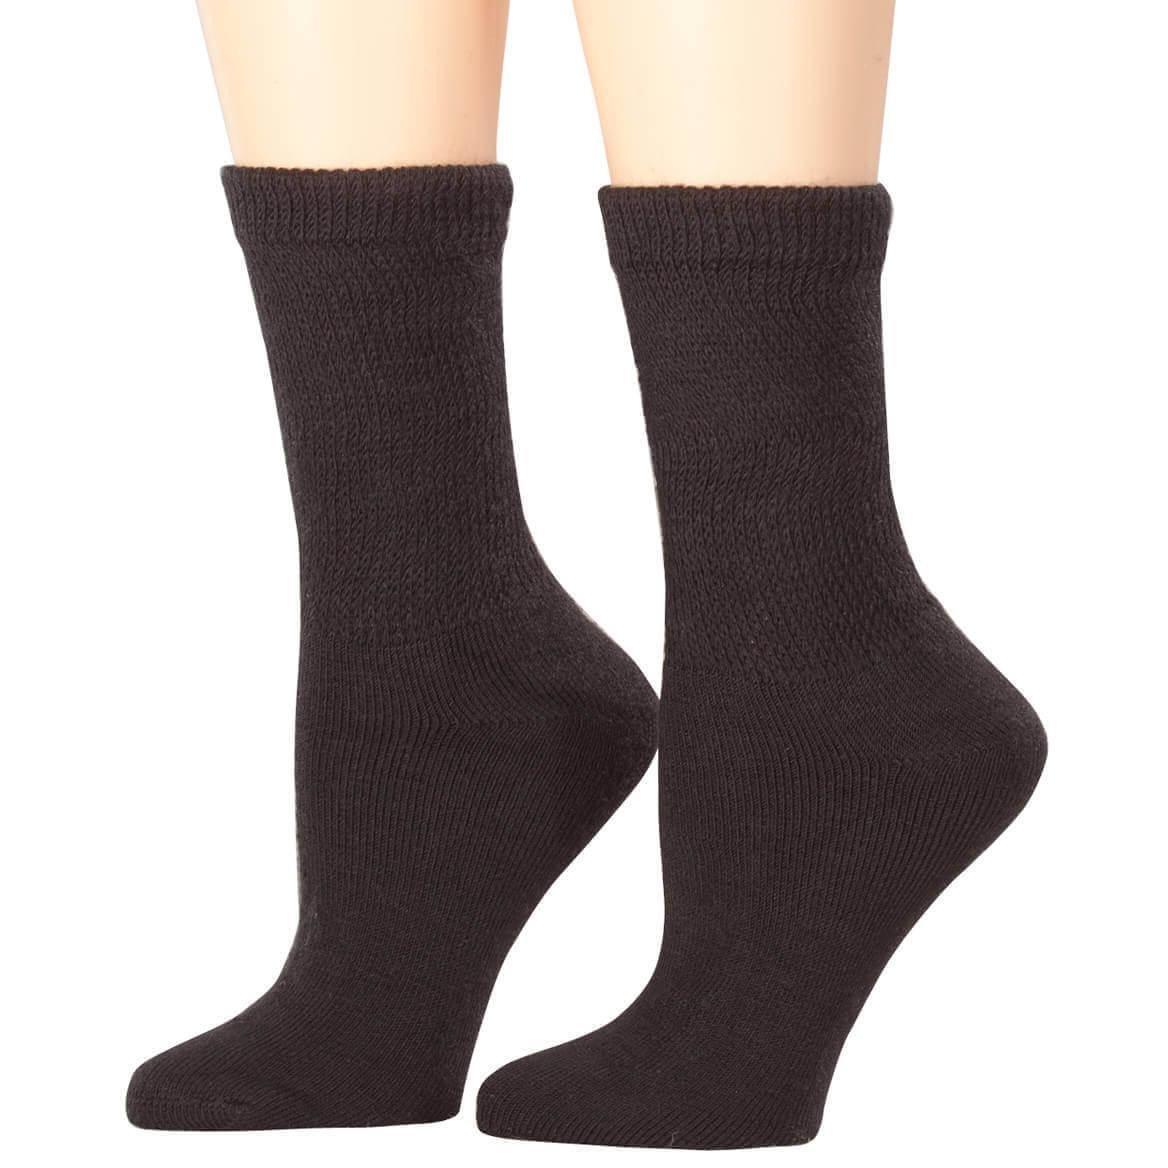 Healthy Steps Extra Plush Socks - Diabetic Socks - Walter Drake